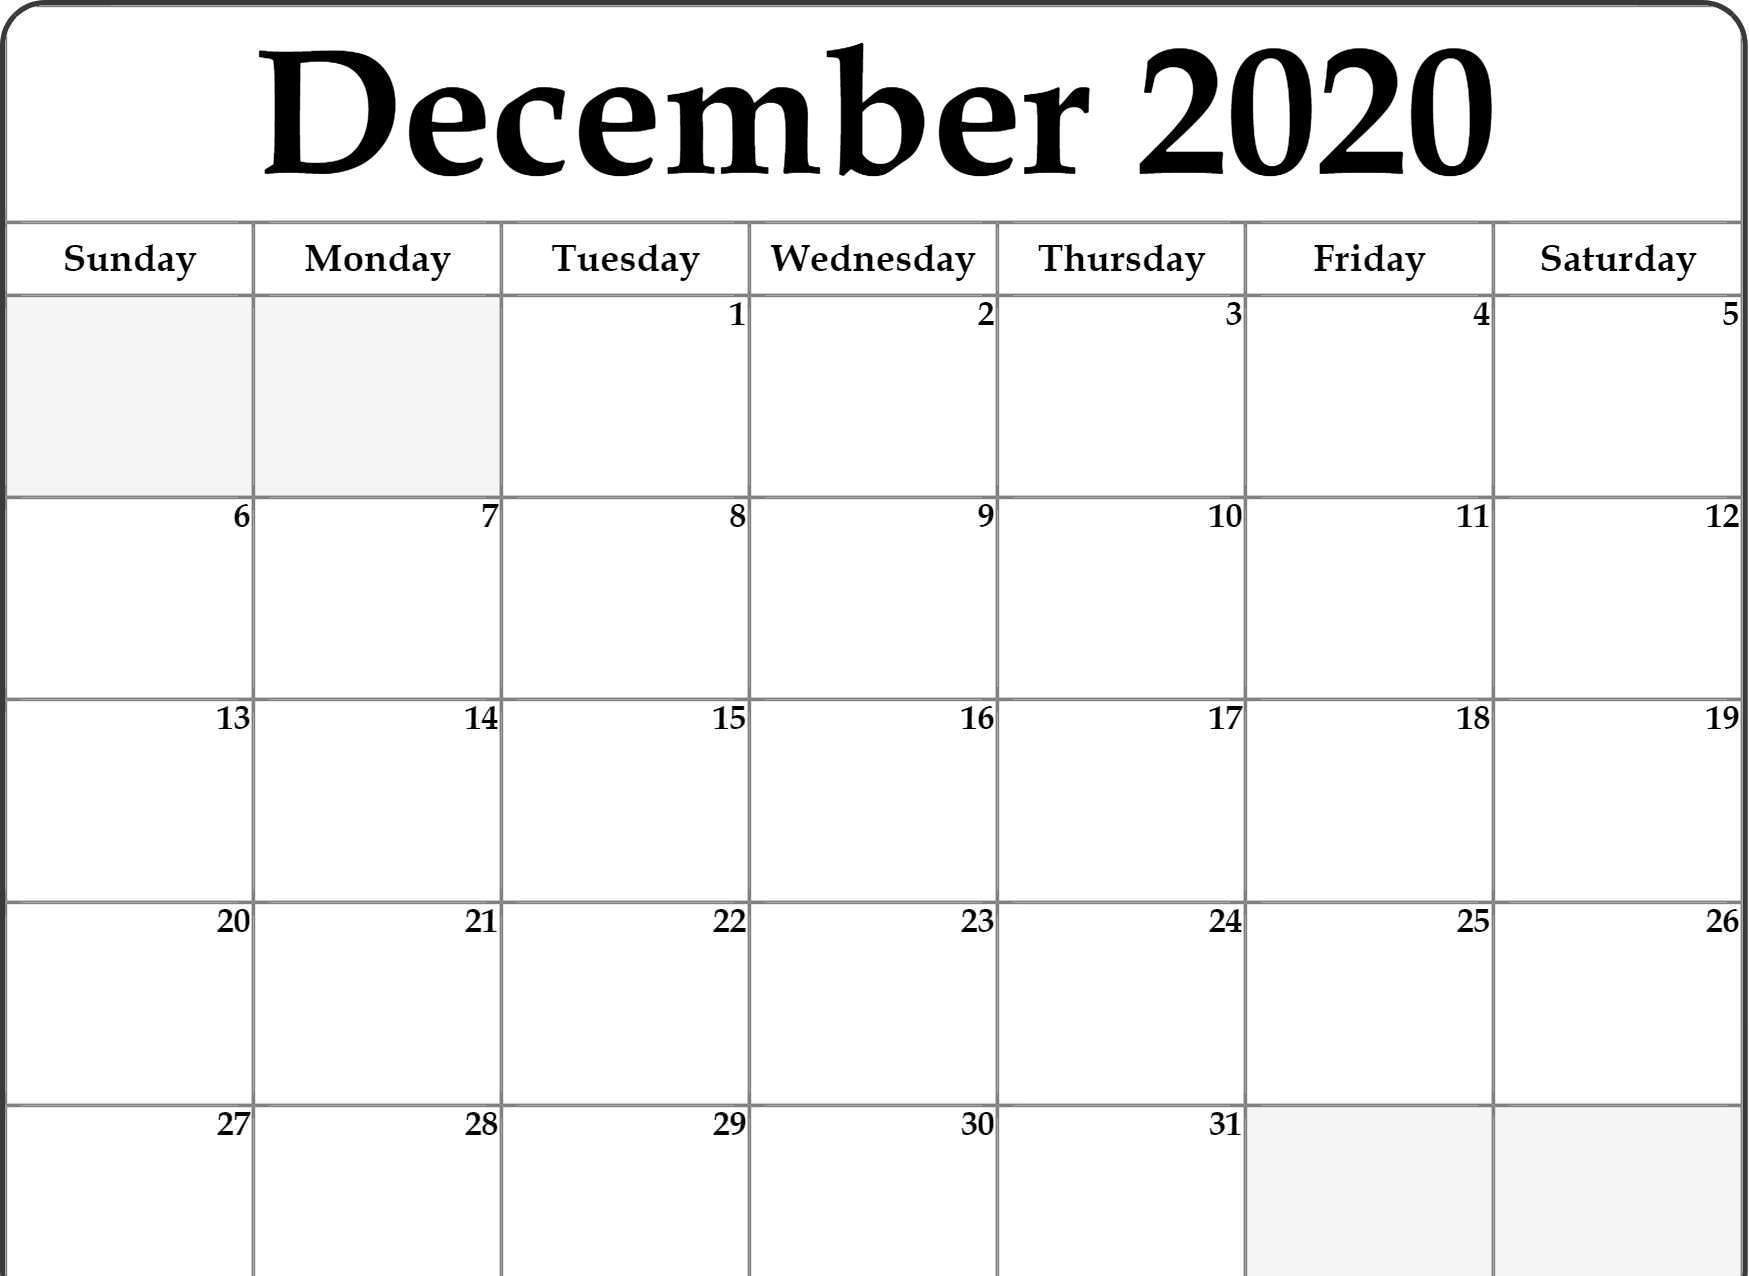 Printable December 2020 Calendar.December 2020 Calendar Wallpapers Top Free December 2020